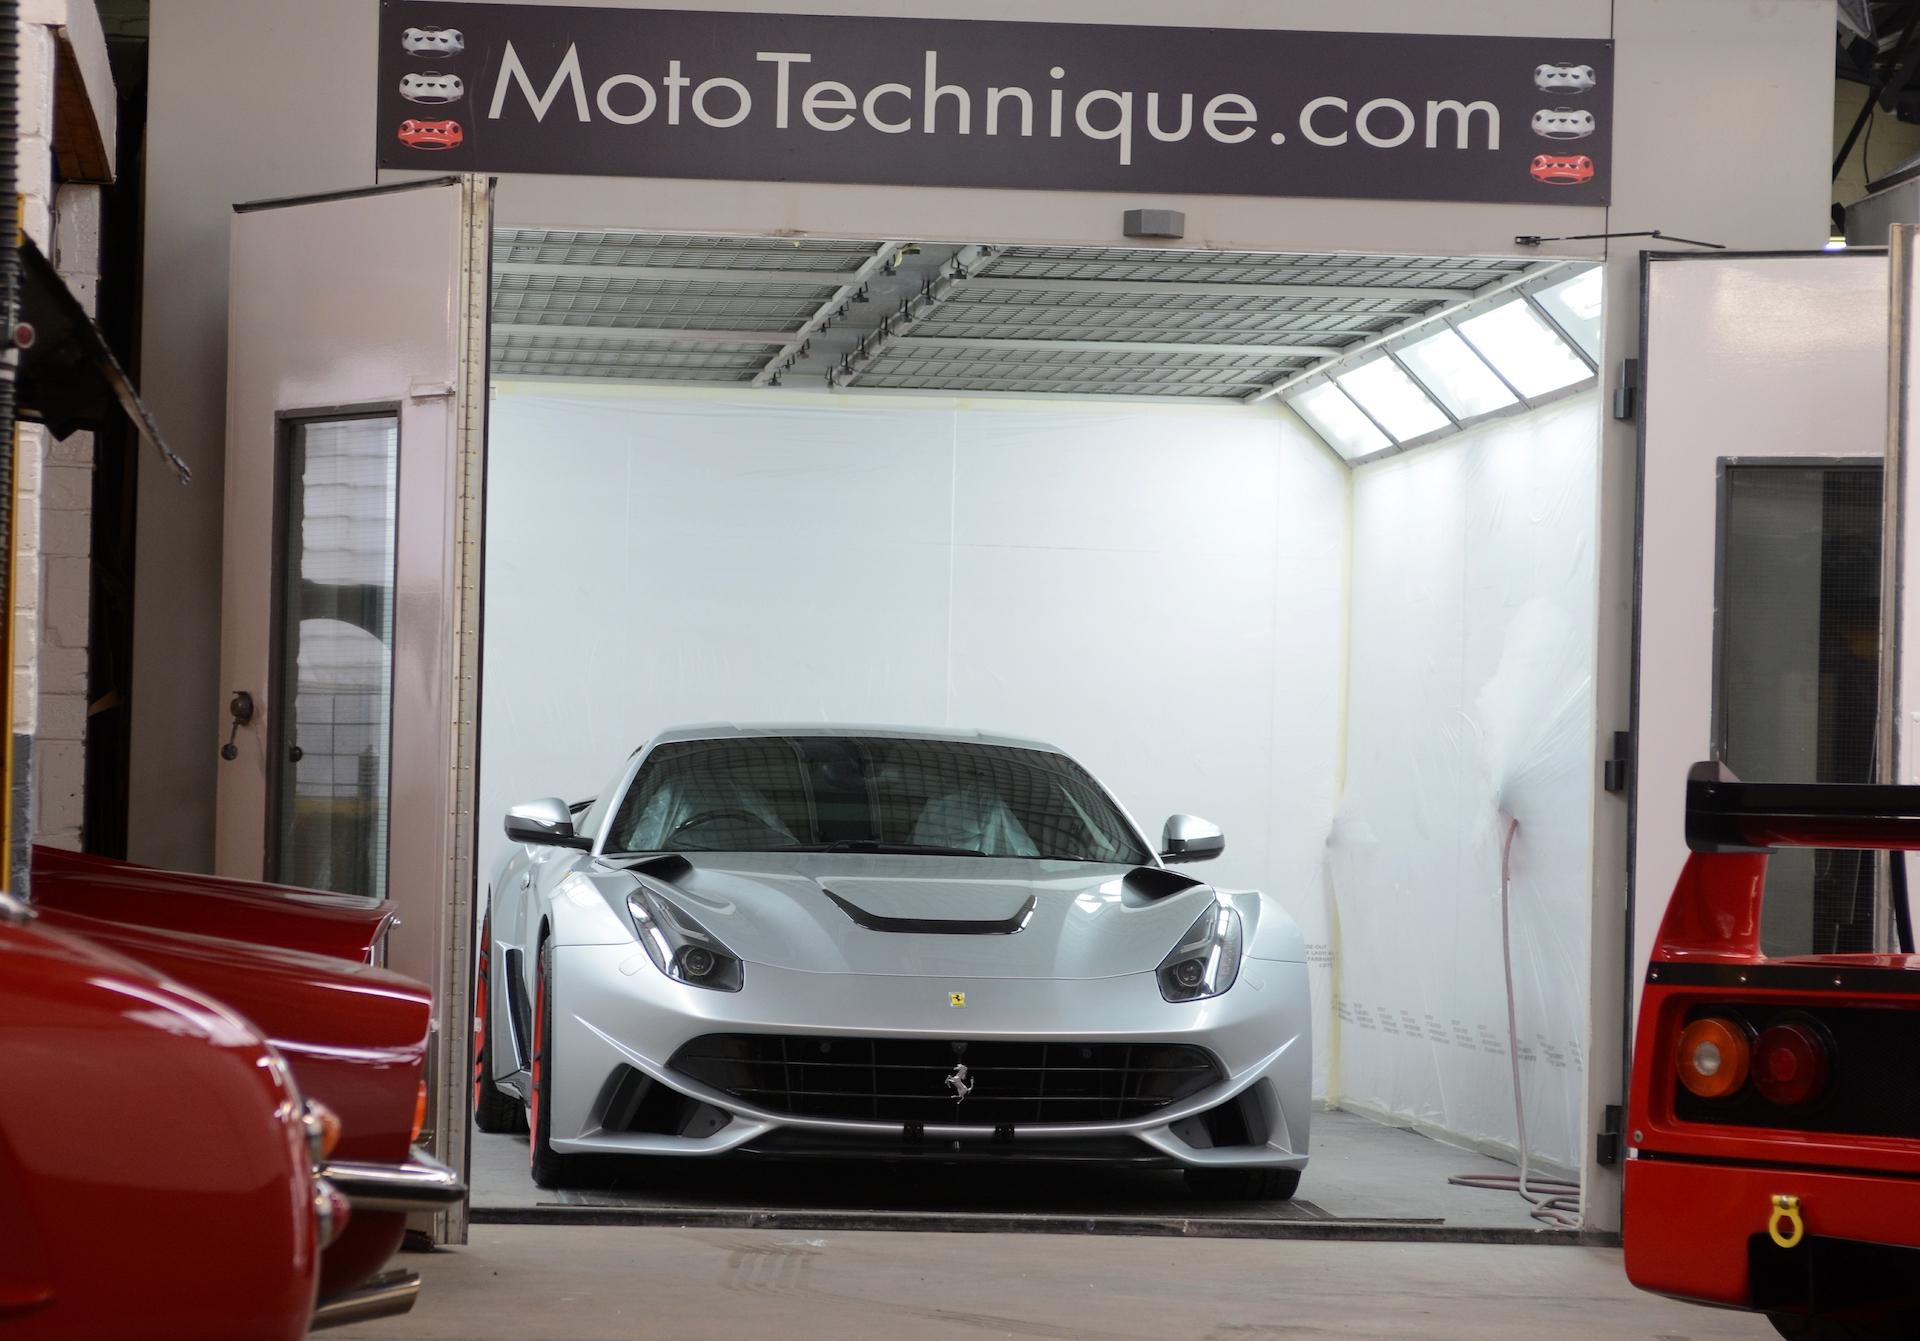 22 Ferrari F12 22 - Copy.JPG